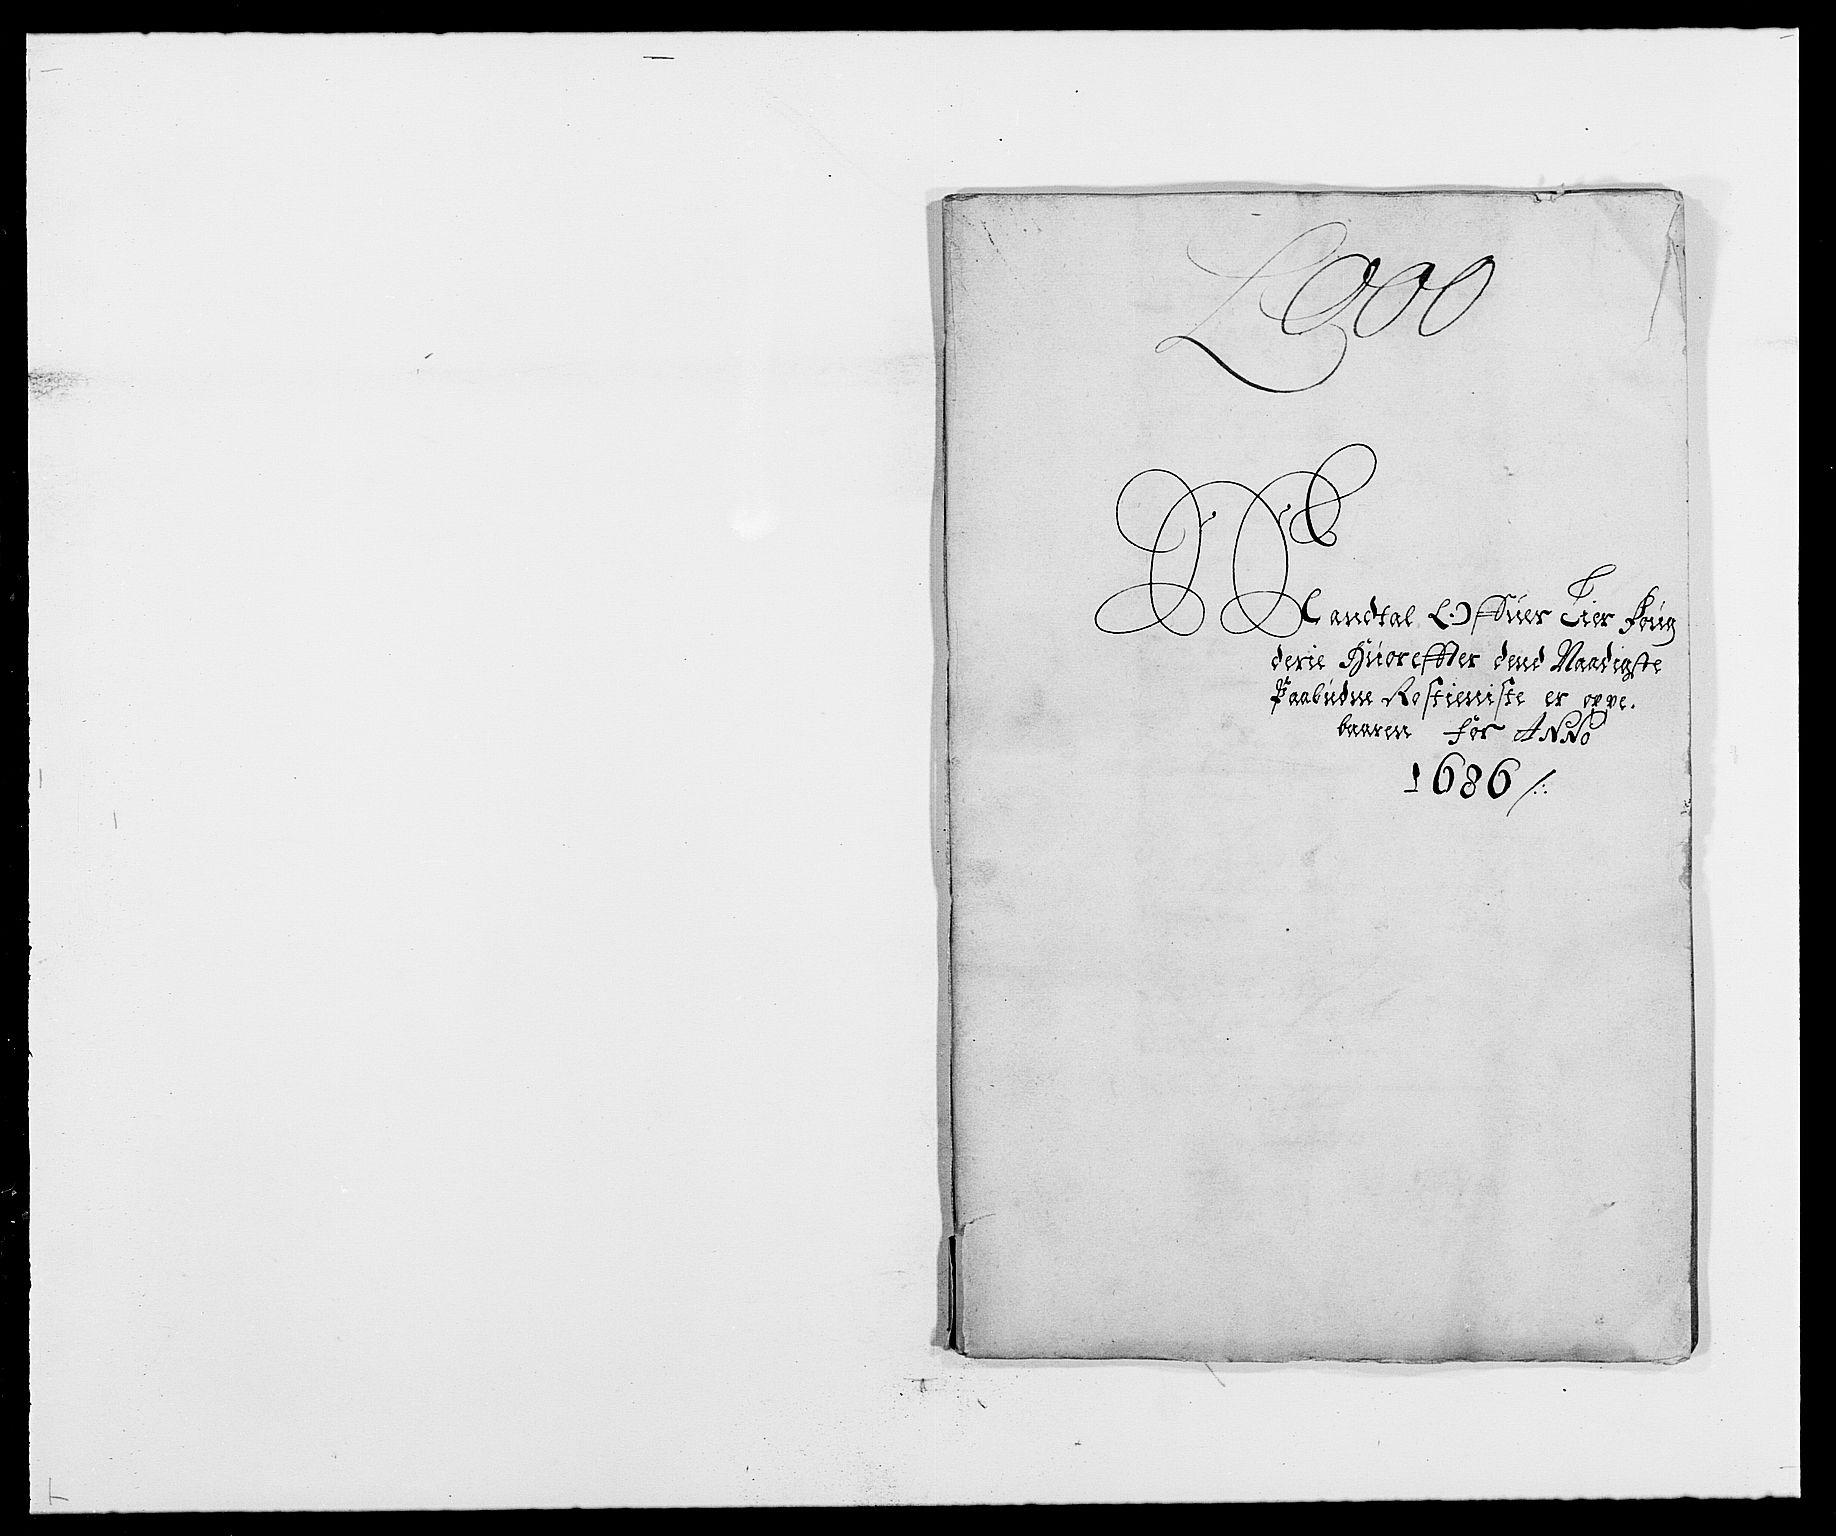 RA, Rentekammeret inntil 1814, Reviderte regnskaper, Fogderegnskap, R27/L1687: Fogderegnskap Lier, 1678-1686, s. 283